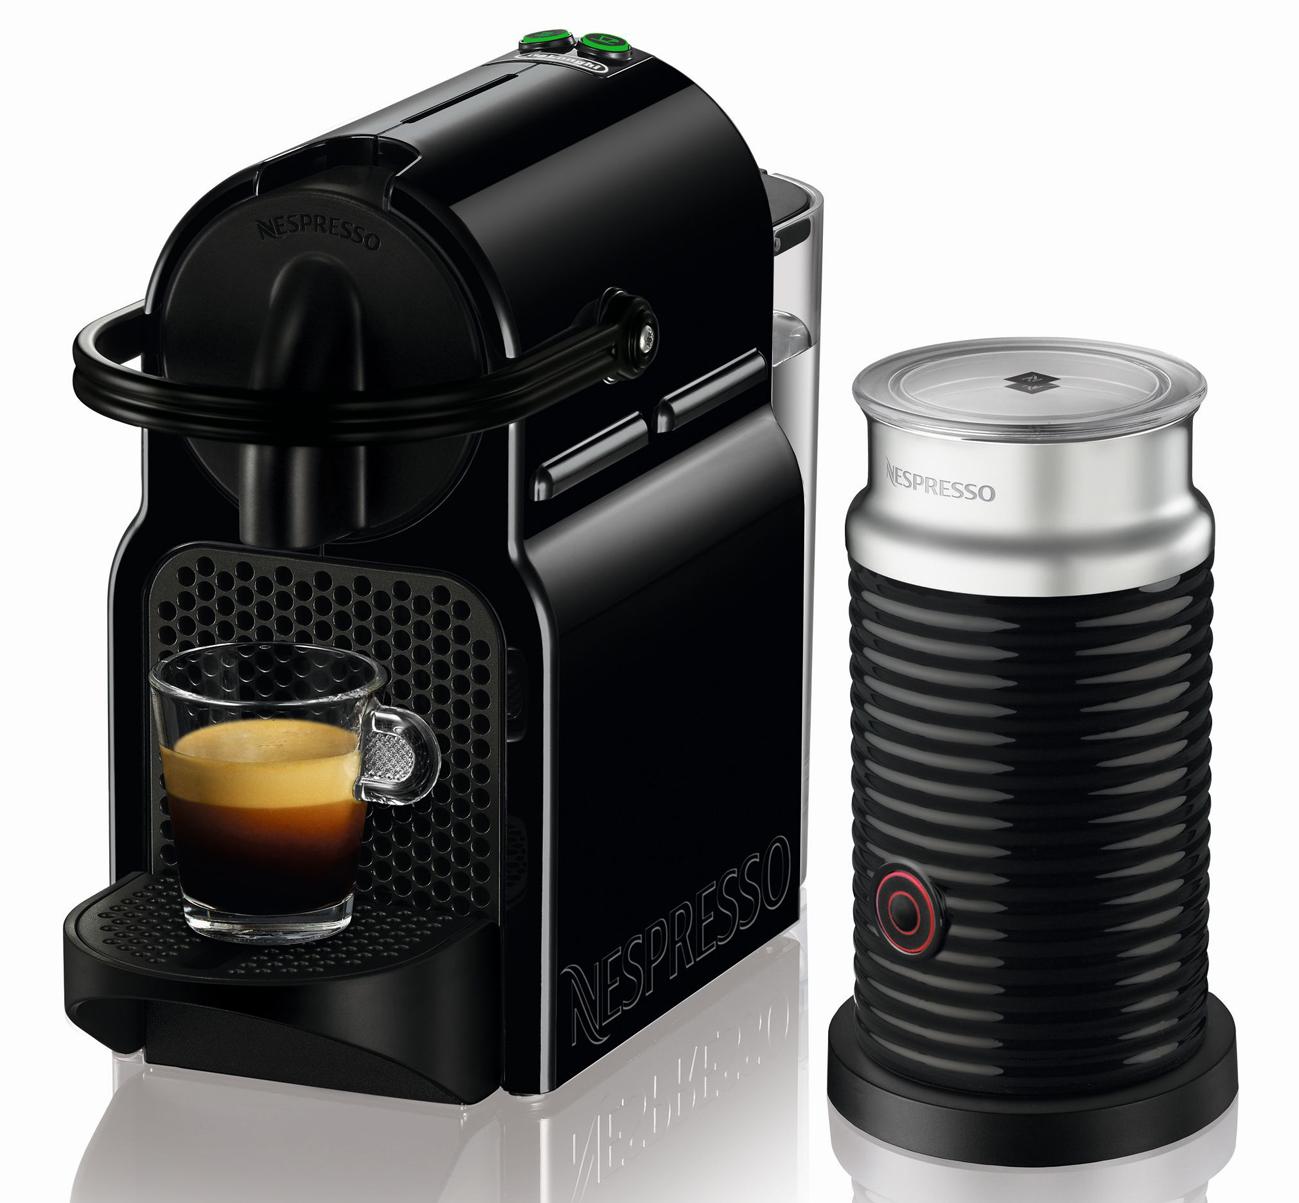 nespresso kaffeemaschine inissia en80 kapselmaschinen f r einsteiger. Black Bedroom Furniture Sets. Home Design Ideas